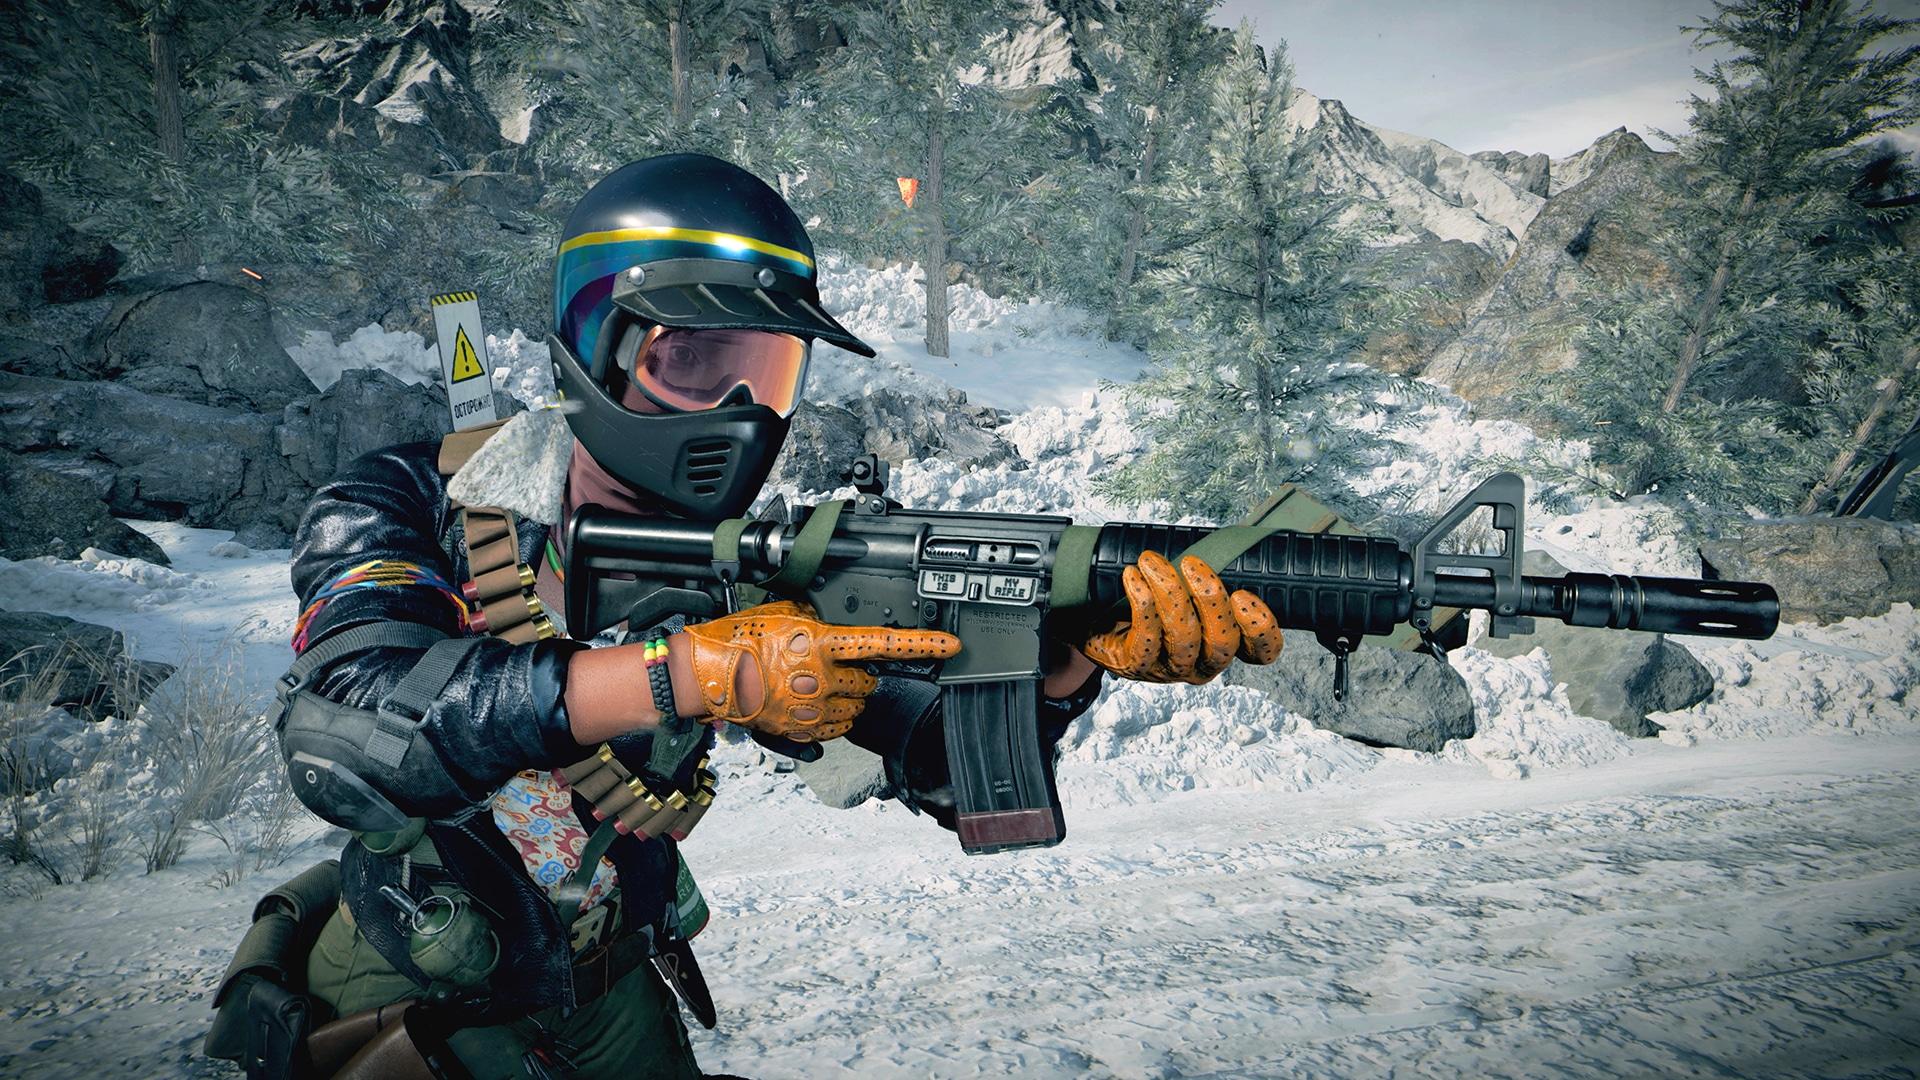 Latest Black Ops Cold War Update 1.17